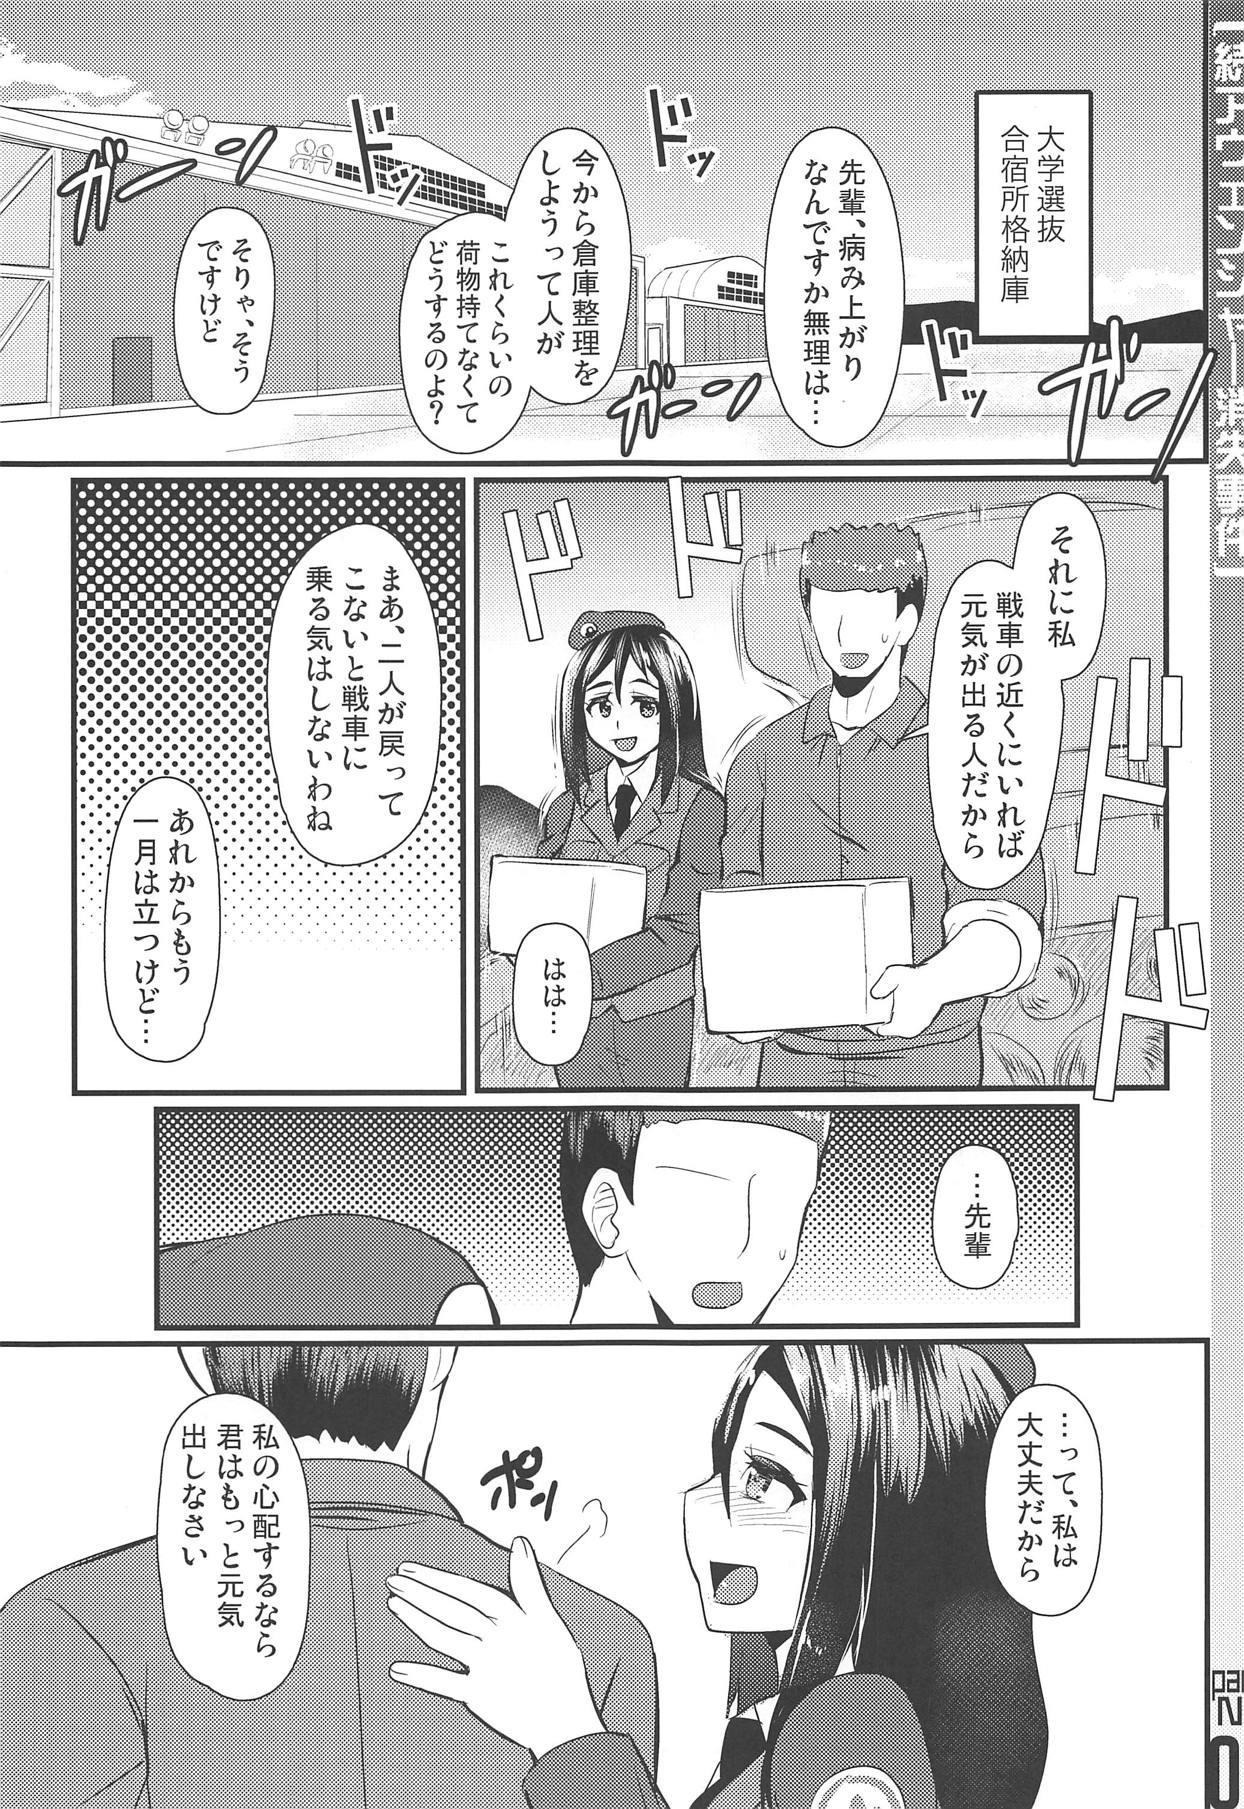 (Panzer Vor! 18) [Trample Rigger (Yequo)] Zoku [Me-gata] Avenger Shoushitsu Jiken (Girls und Panzer) 1